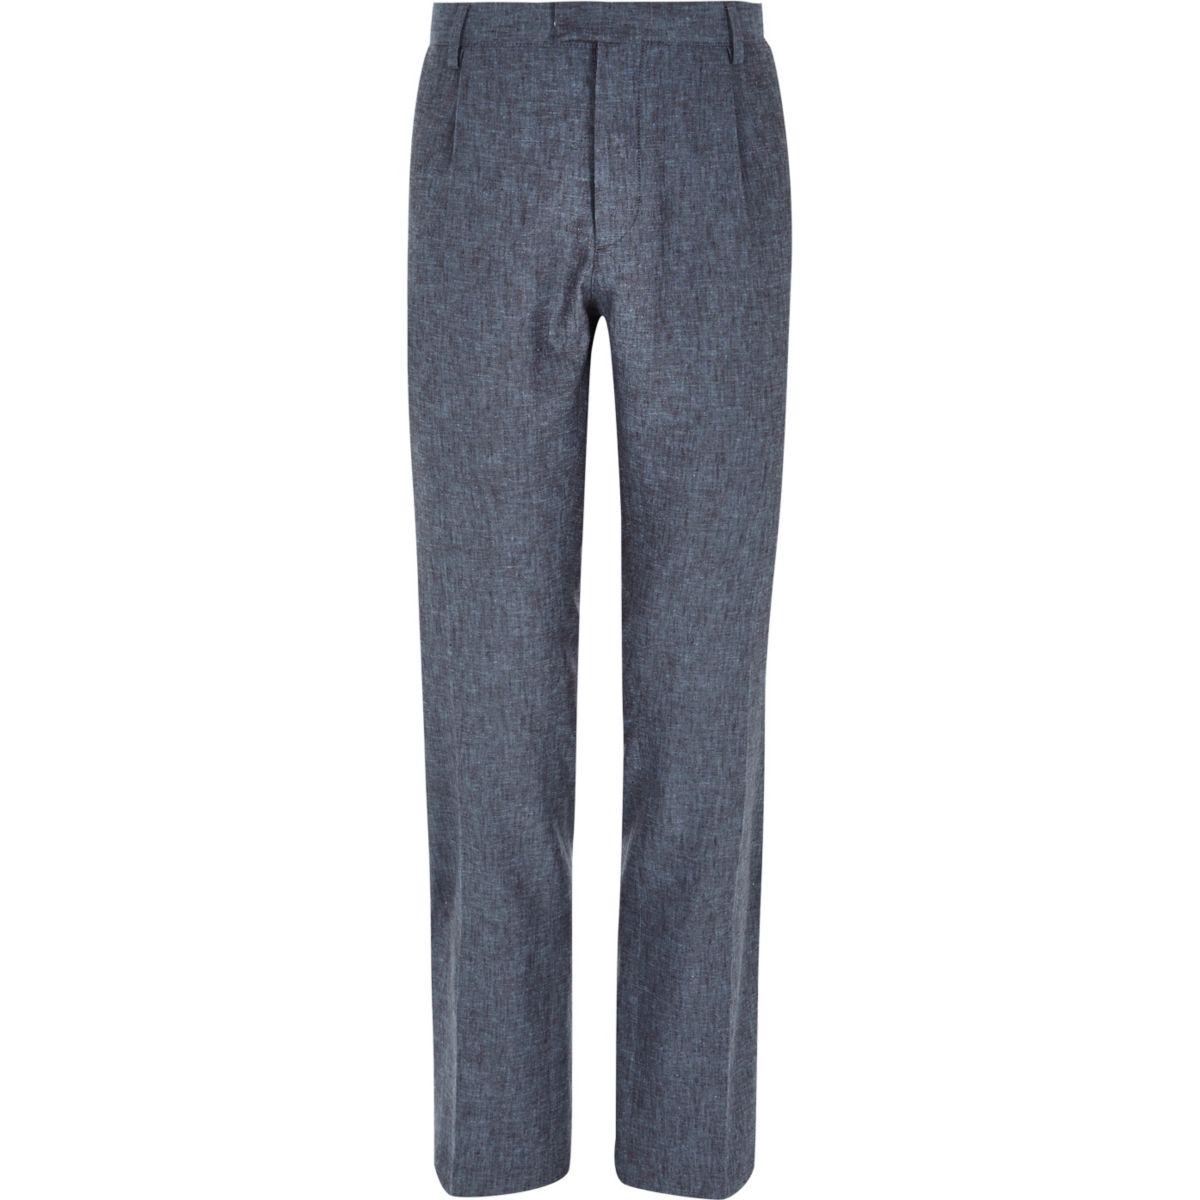 Blue smart pants